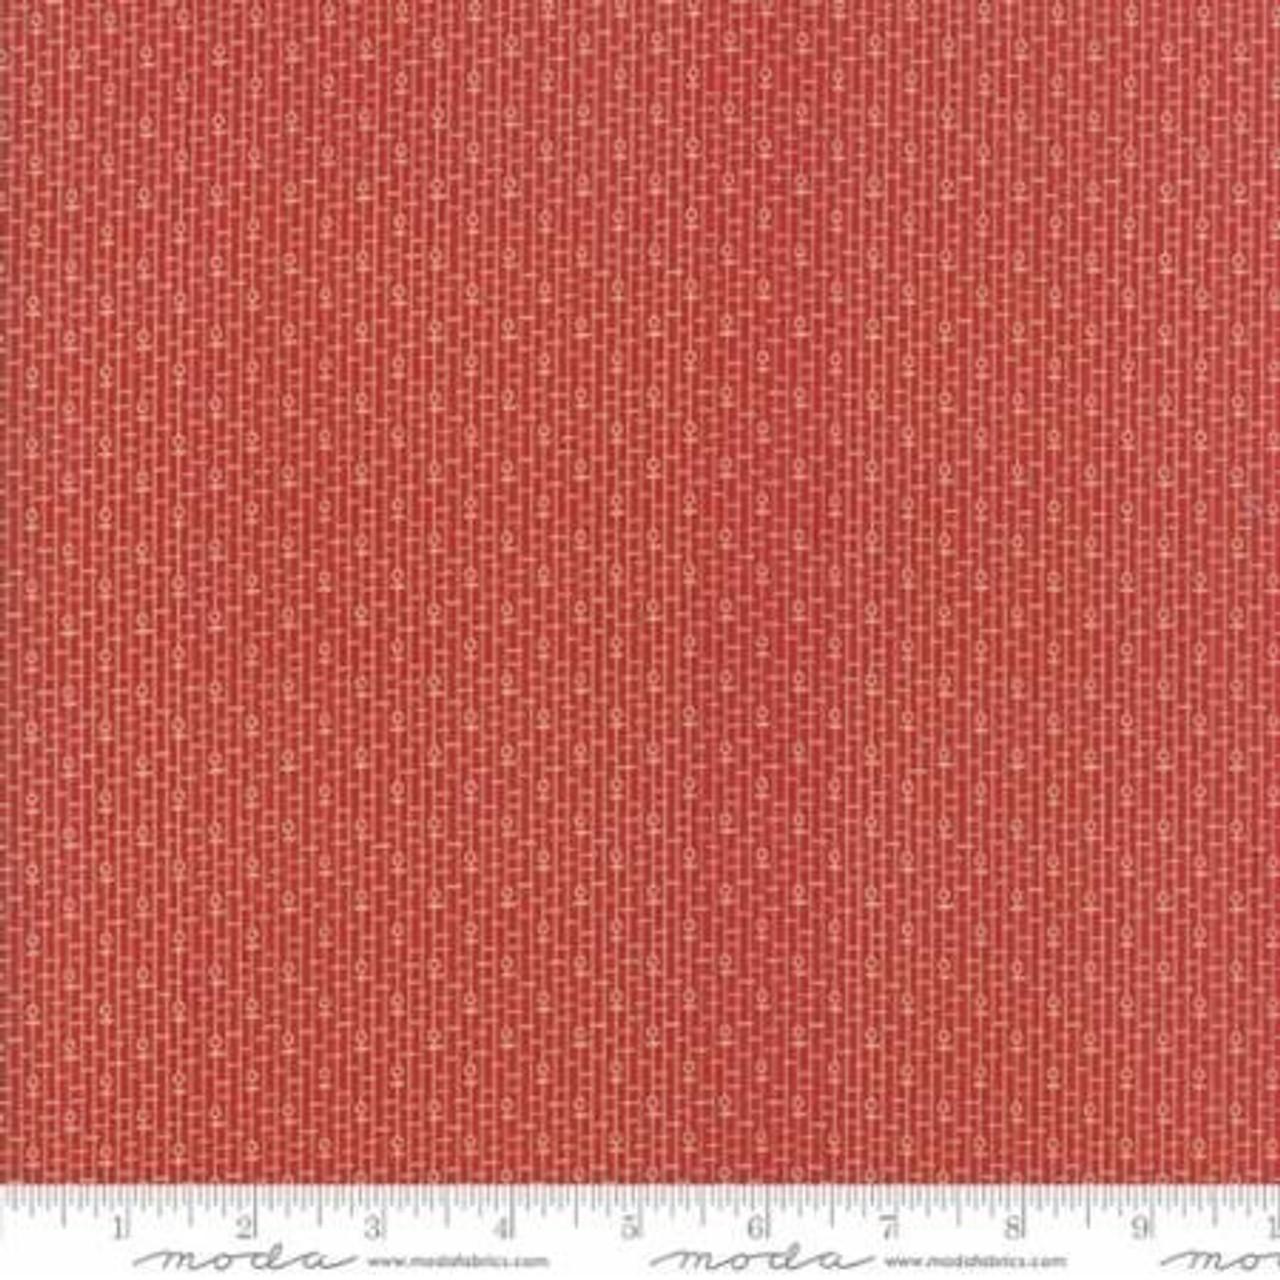 Moda : New Hope Dot Dash - Red